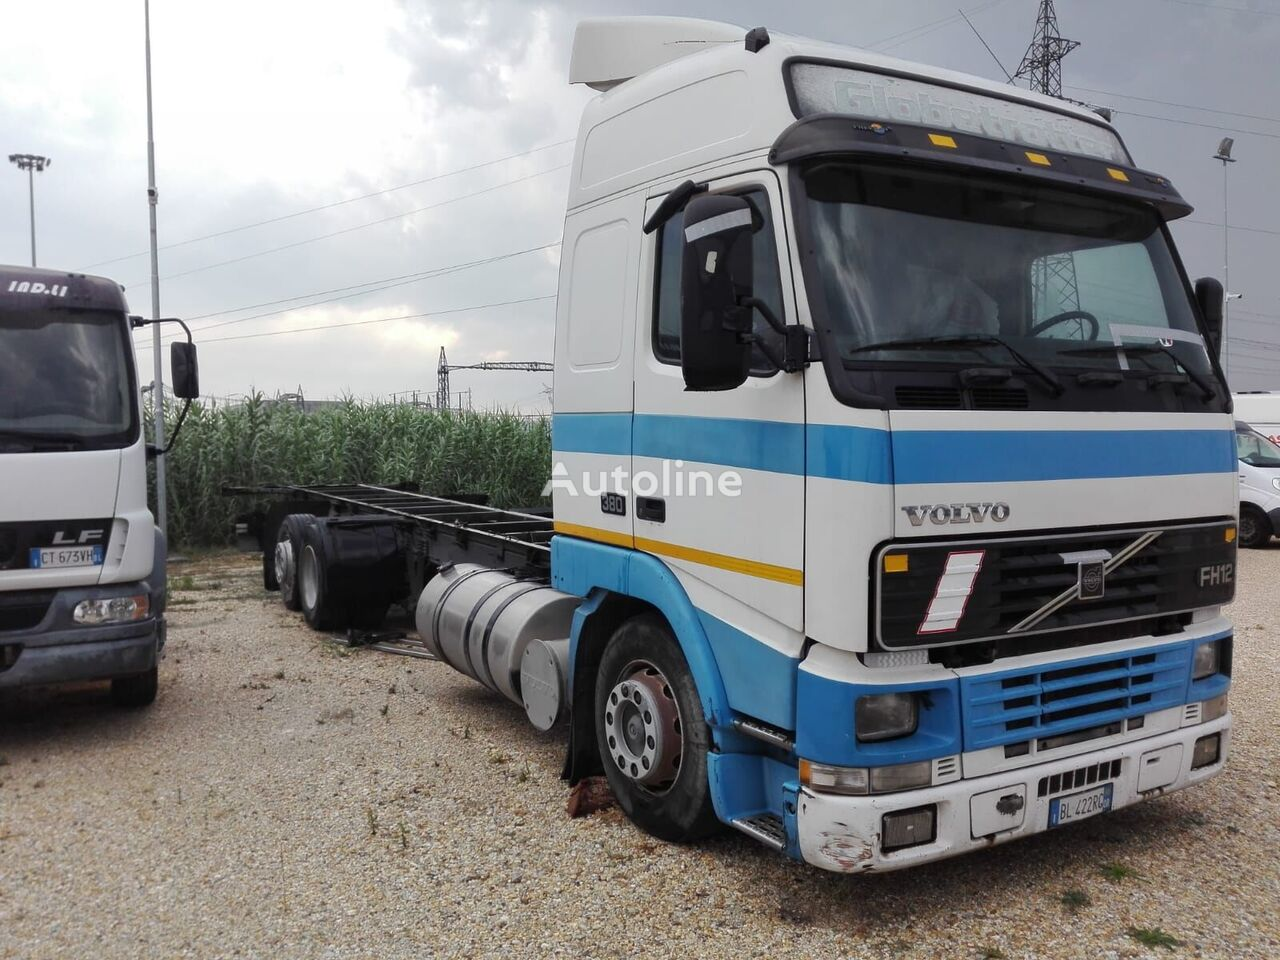 VOLVO FH 12 380 izotermik kamyon